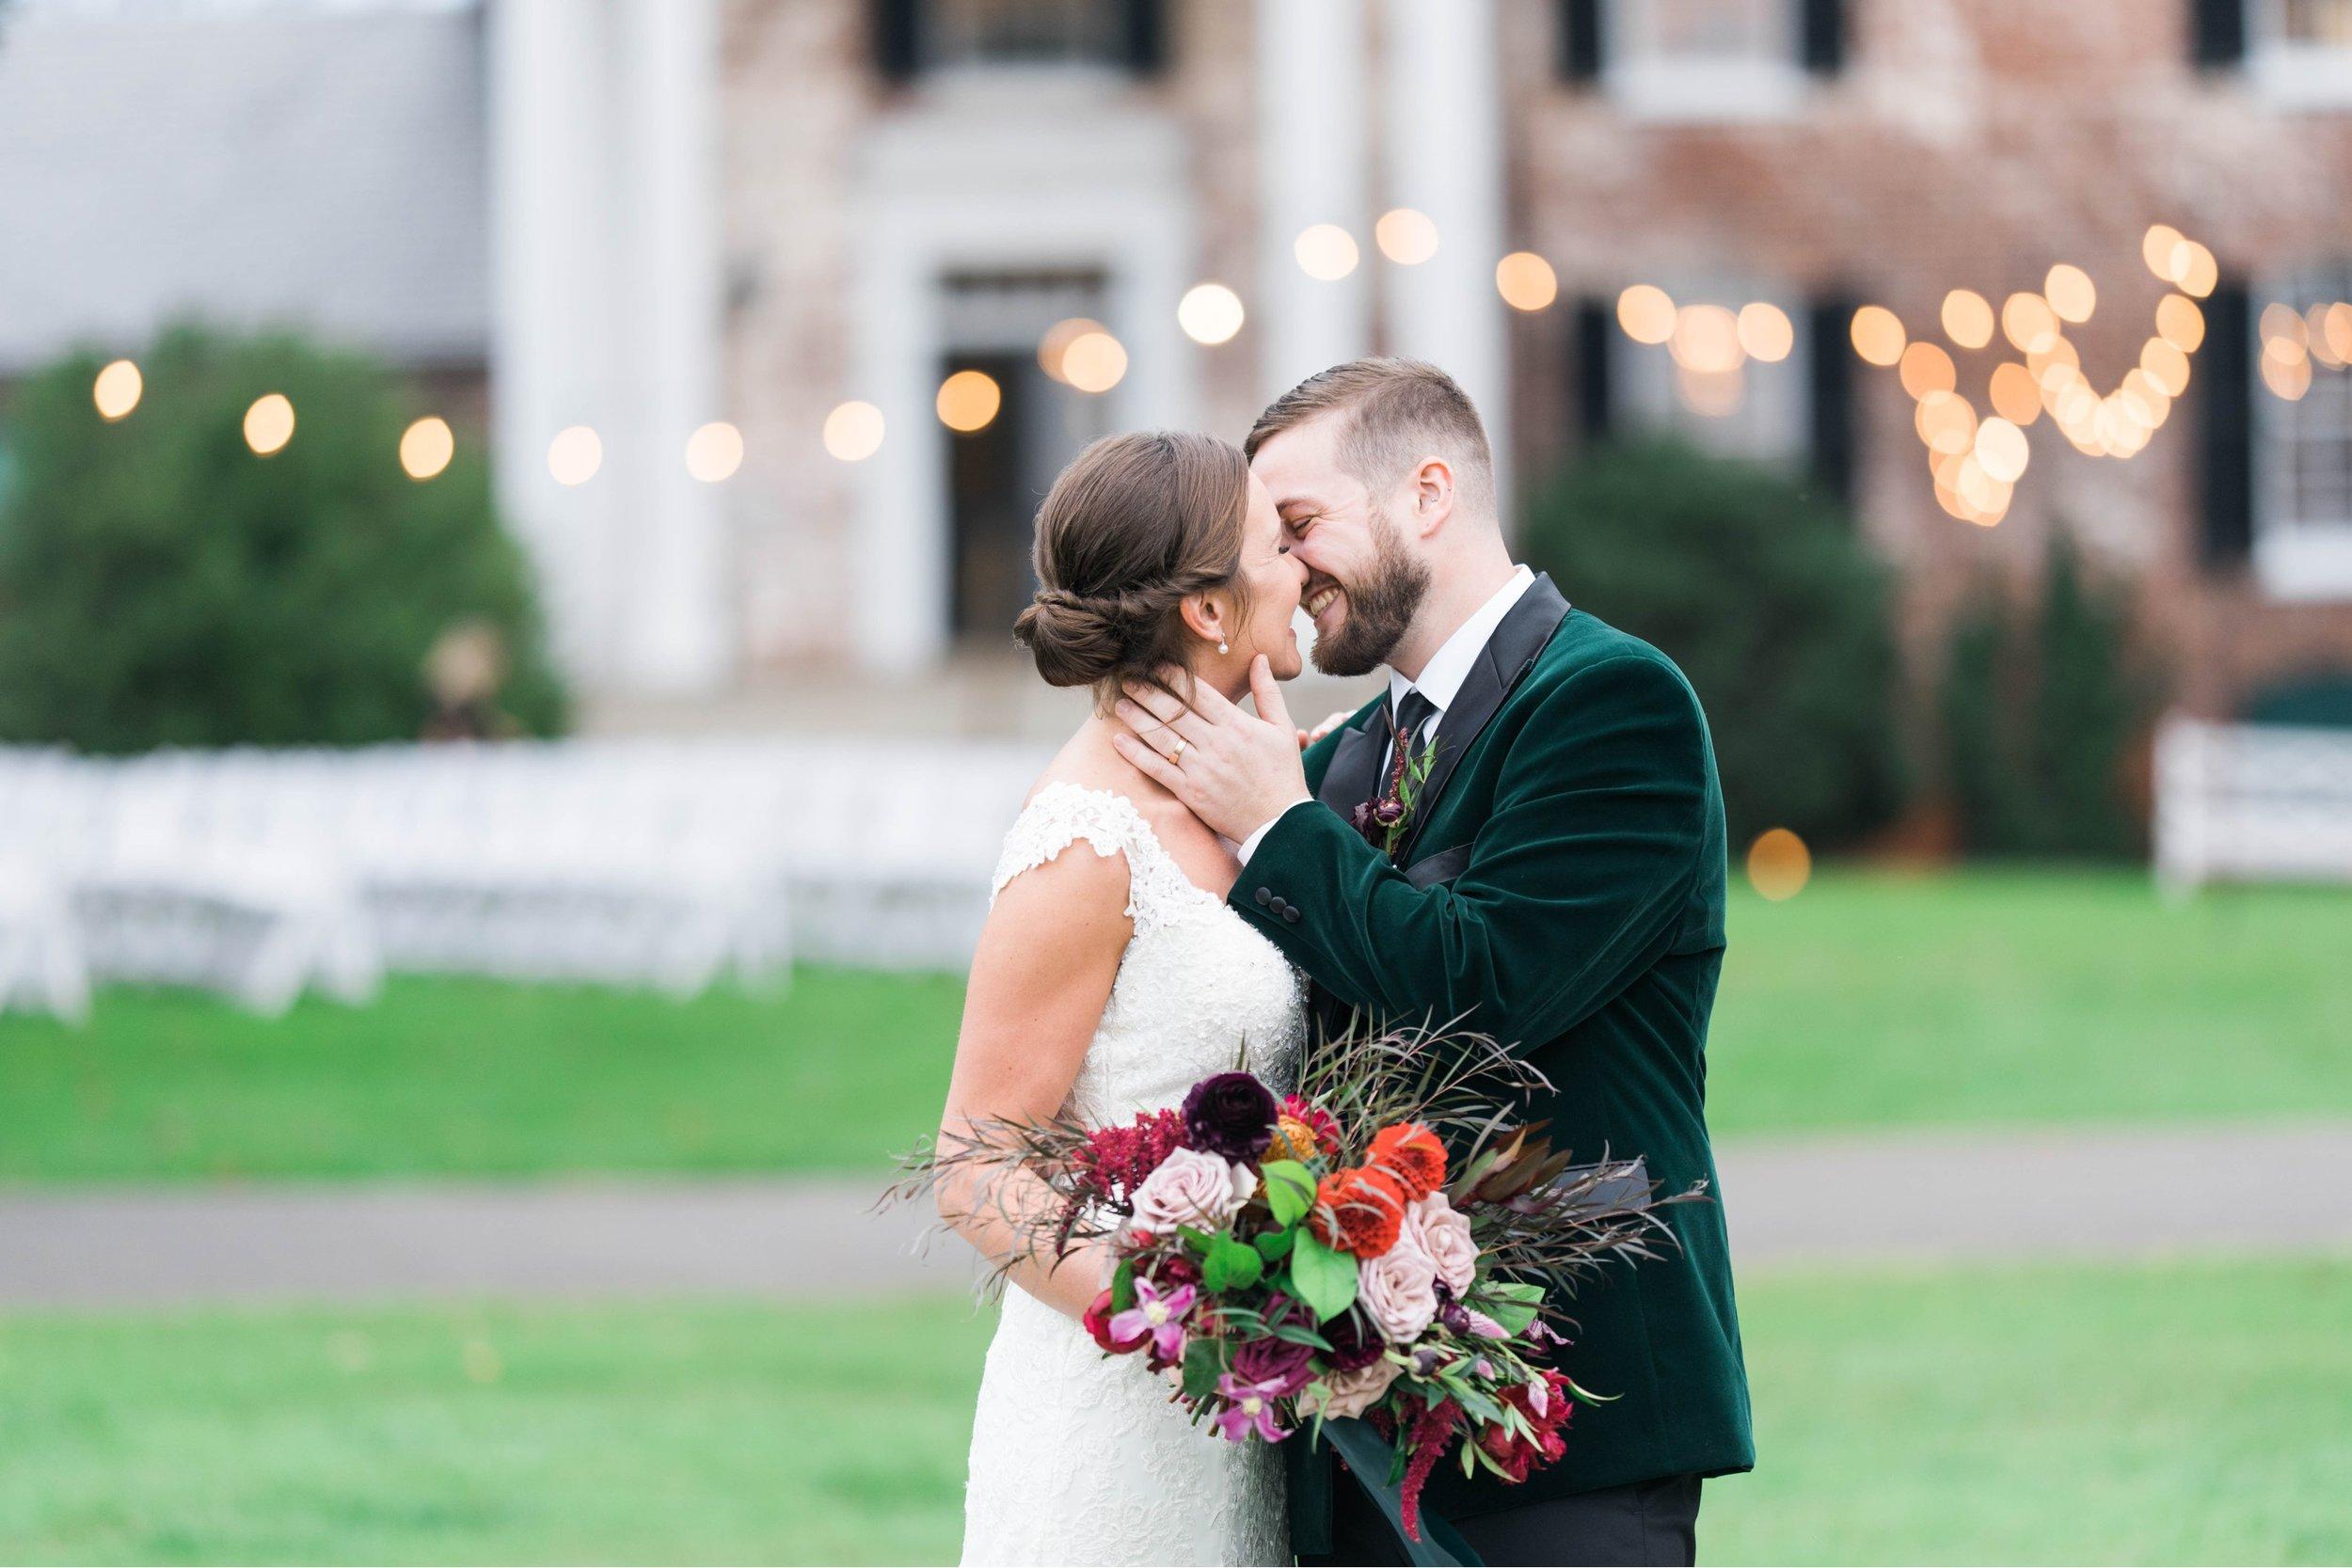 Gordan+Lauren_BoonsboroCountryClubWedding_Virginiaweddingphotographer_LynchburgVi 7.jpg